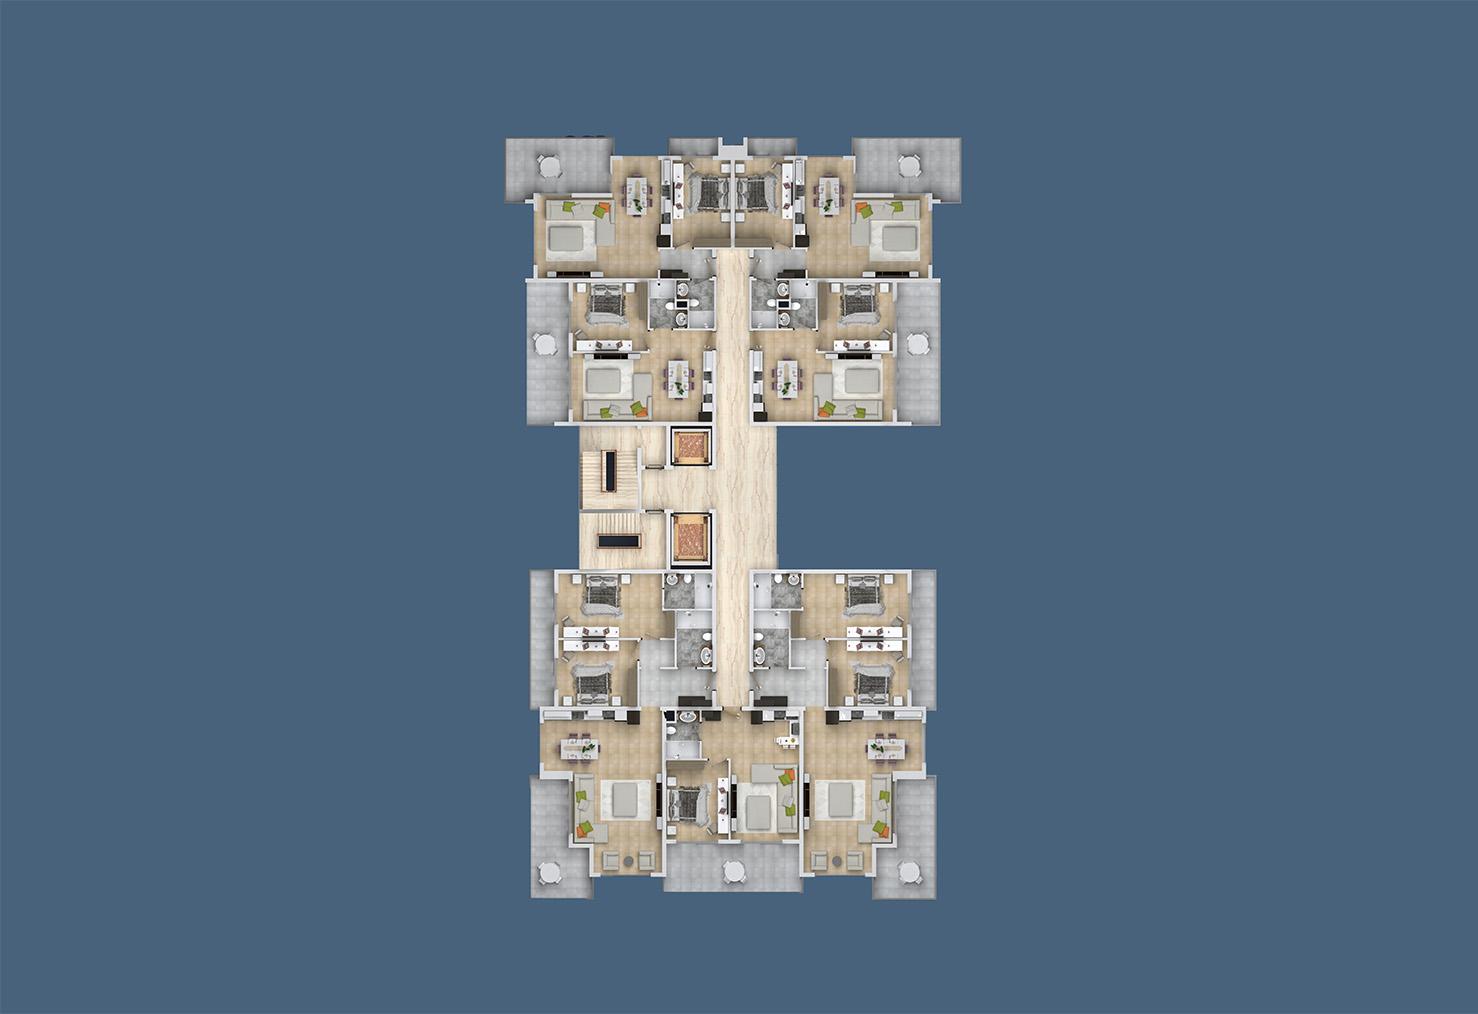 Floor plans of apartments 6 floor «B» Yekta Kingdom Trade Center